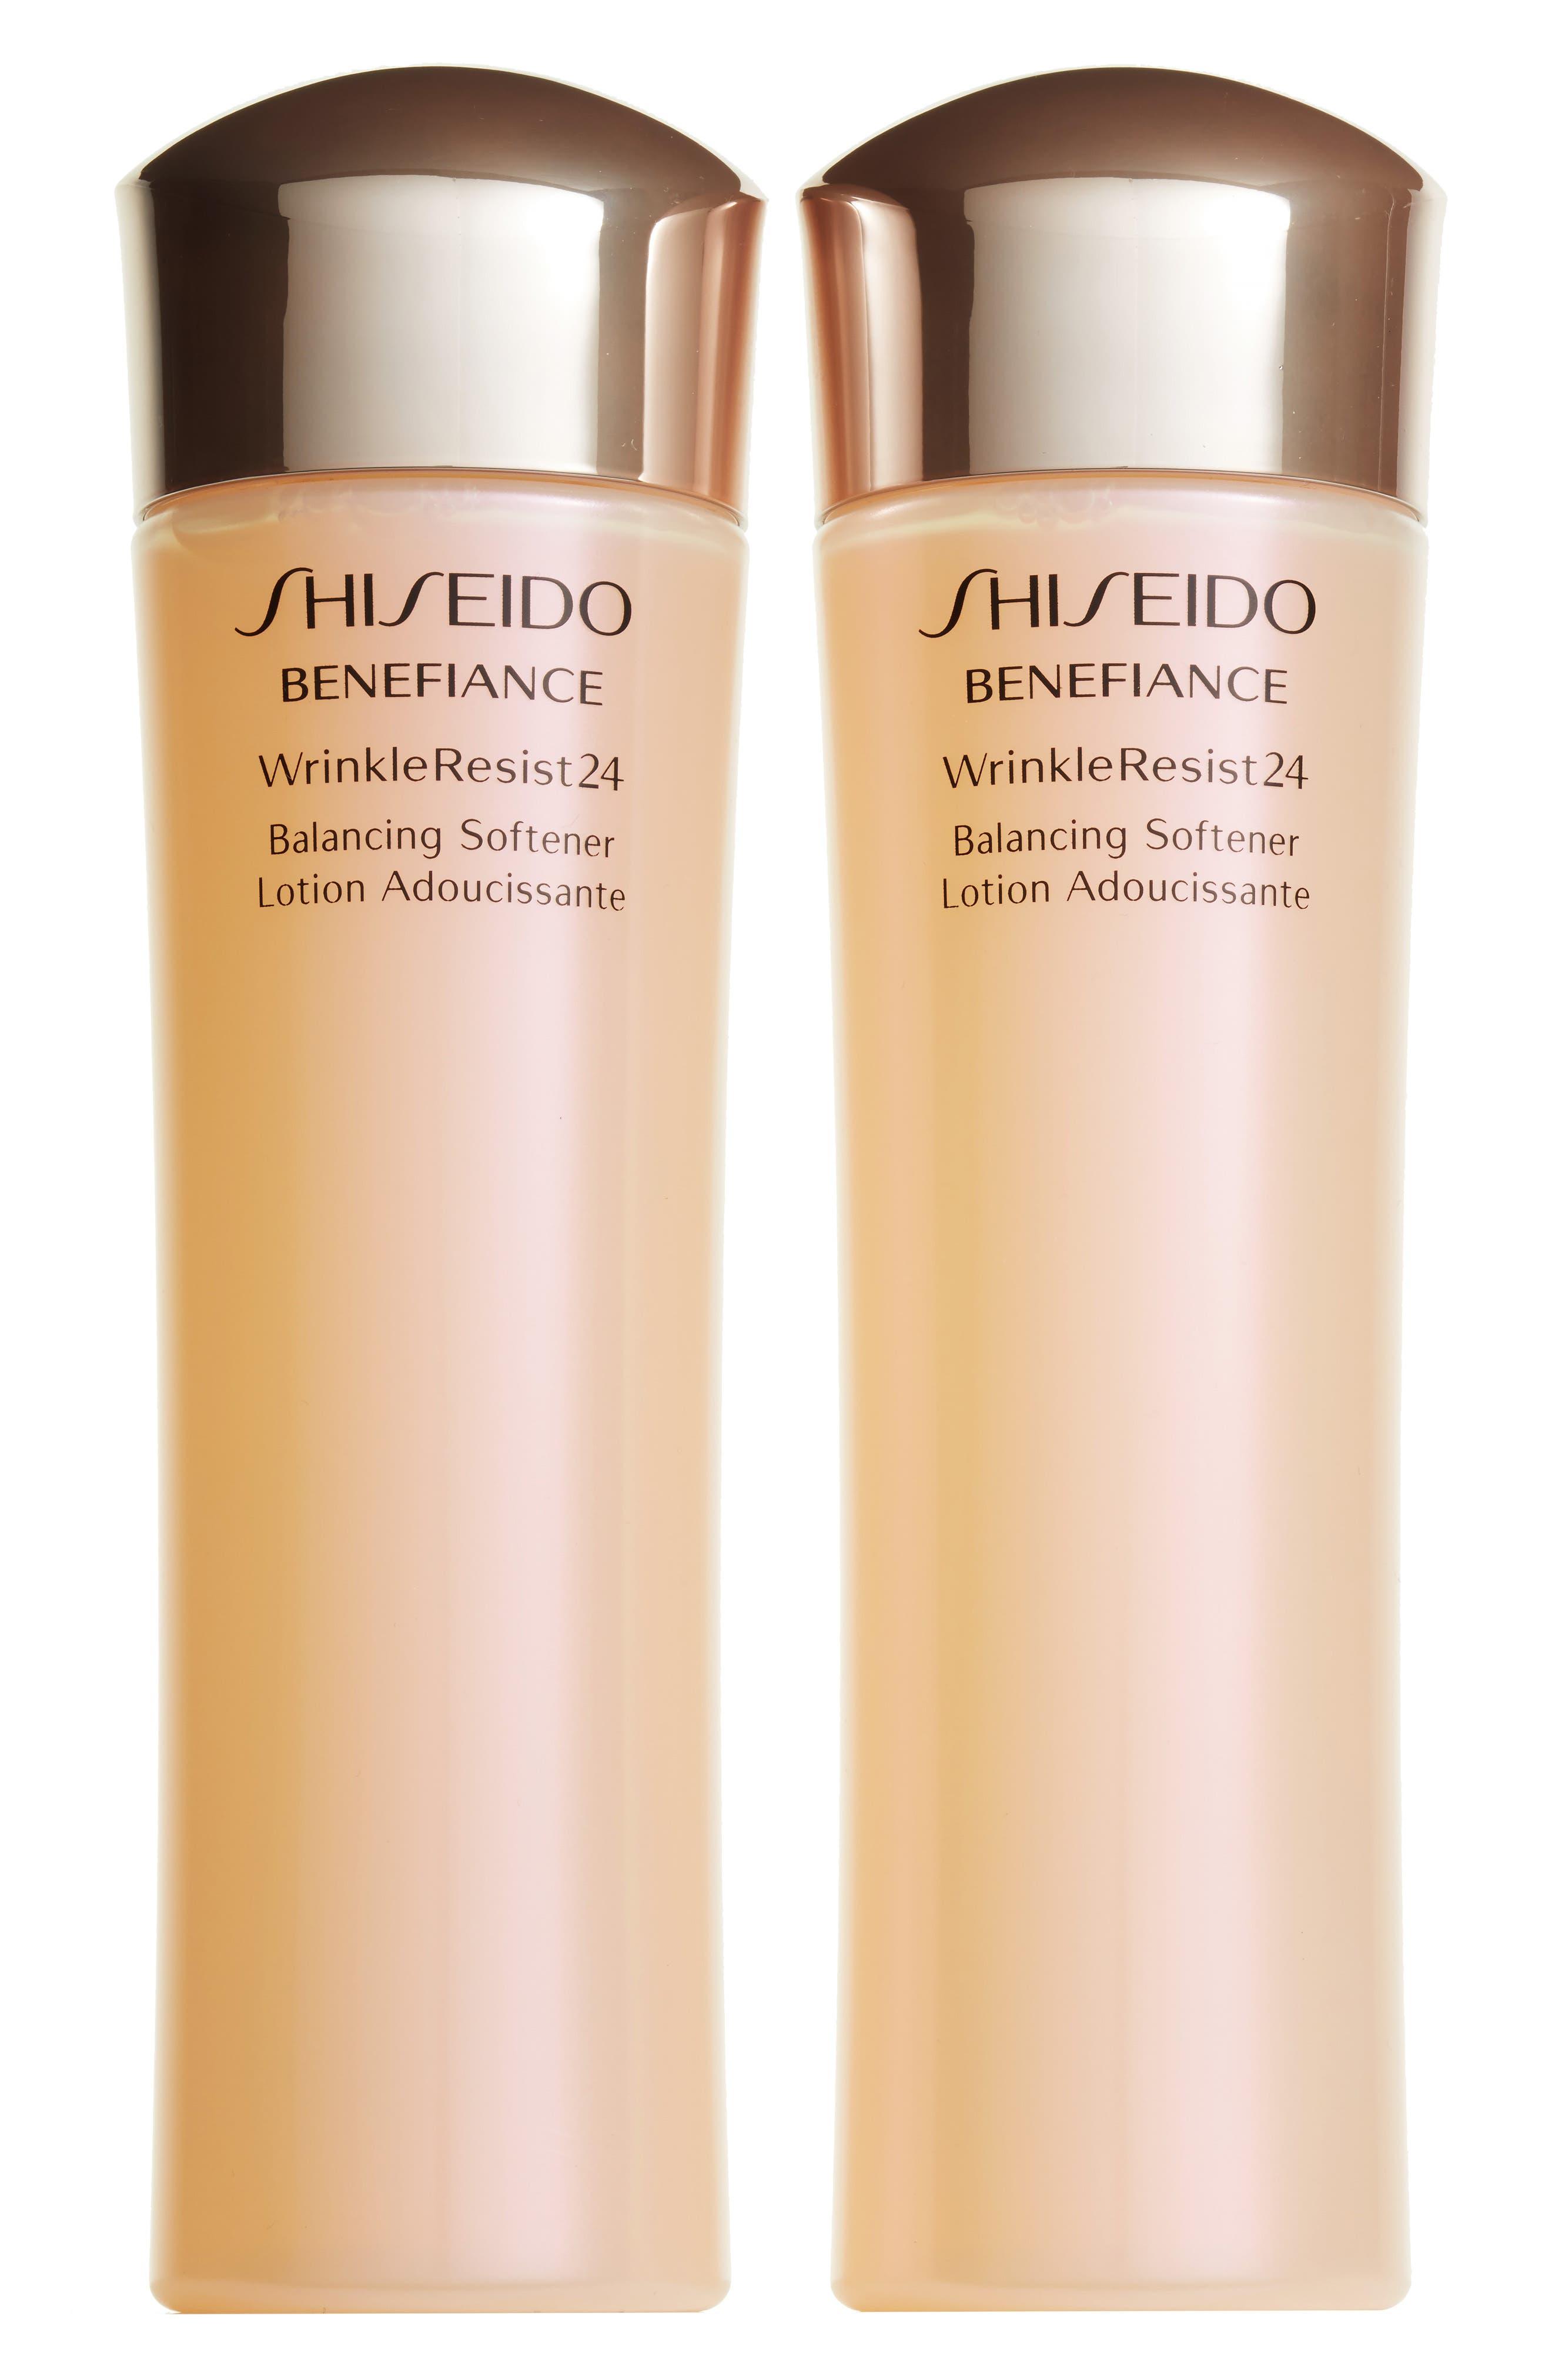 Alternate Image 1 Selected - Shiseido Benefiance WrinkleResist24 Balancing Softener Duo ($146 Value)